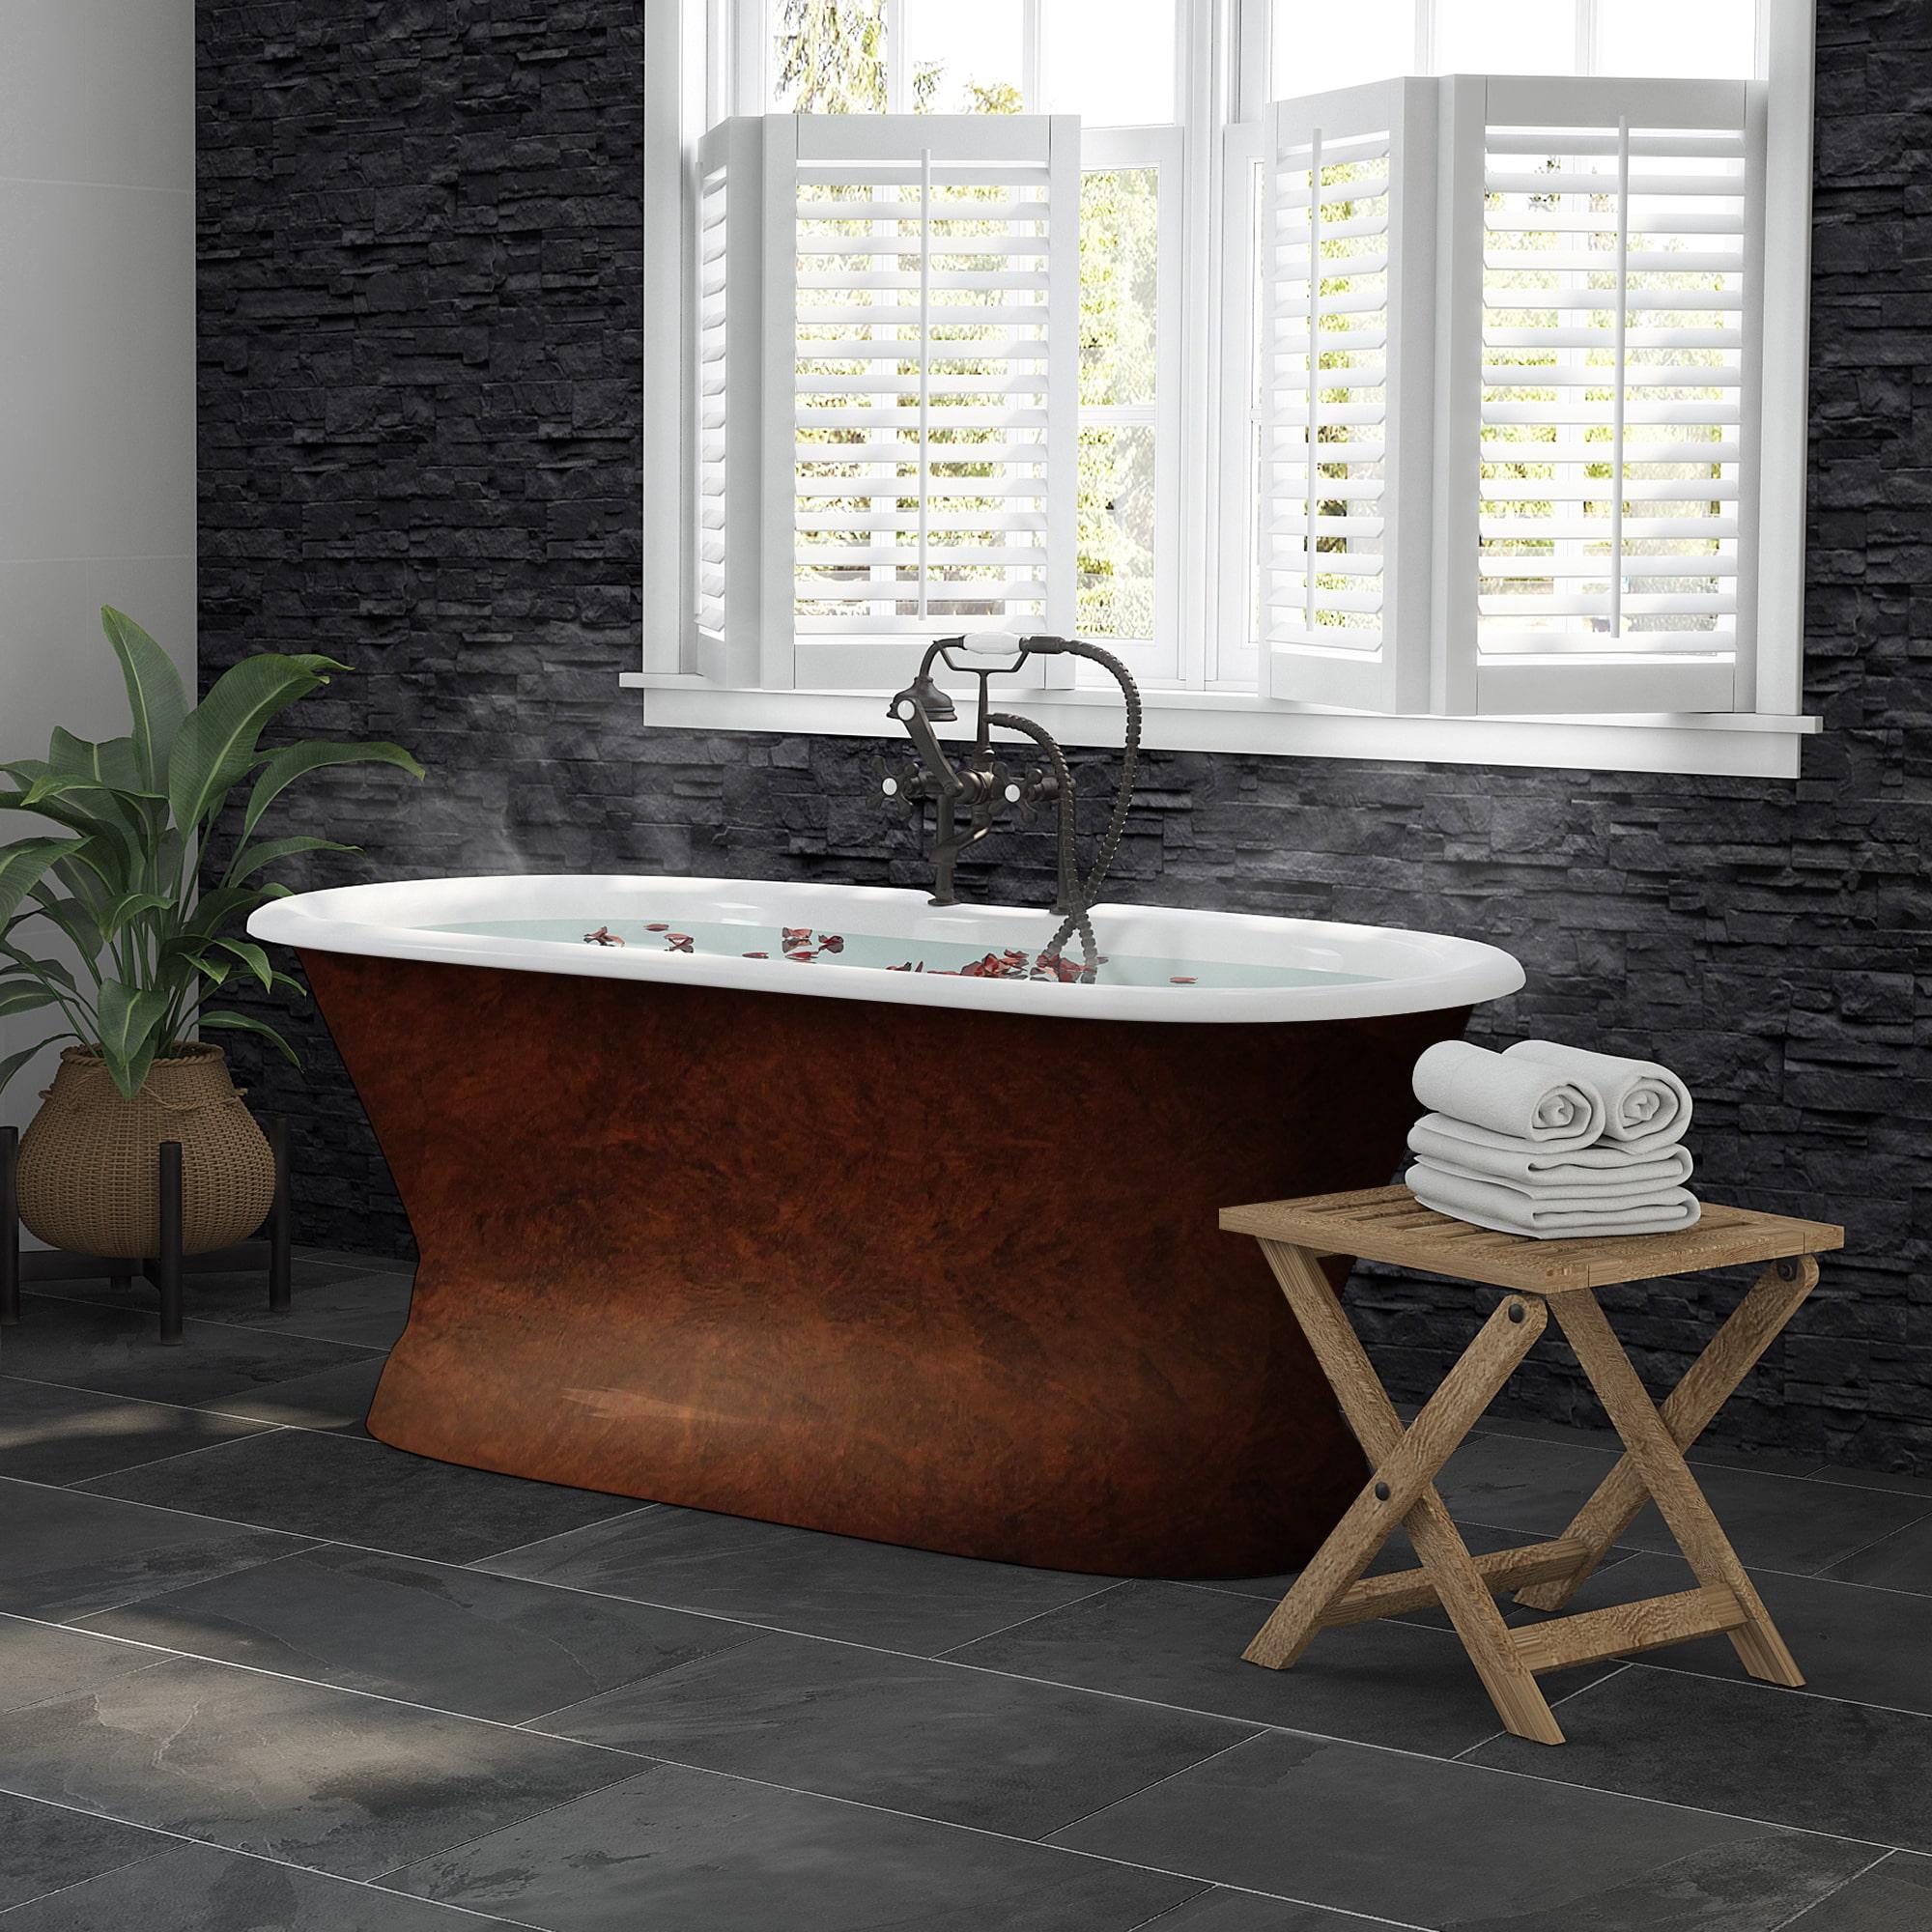 copper bronze, cast iron, double ended, pedestal tub,